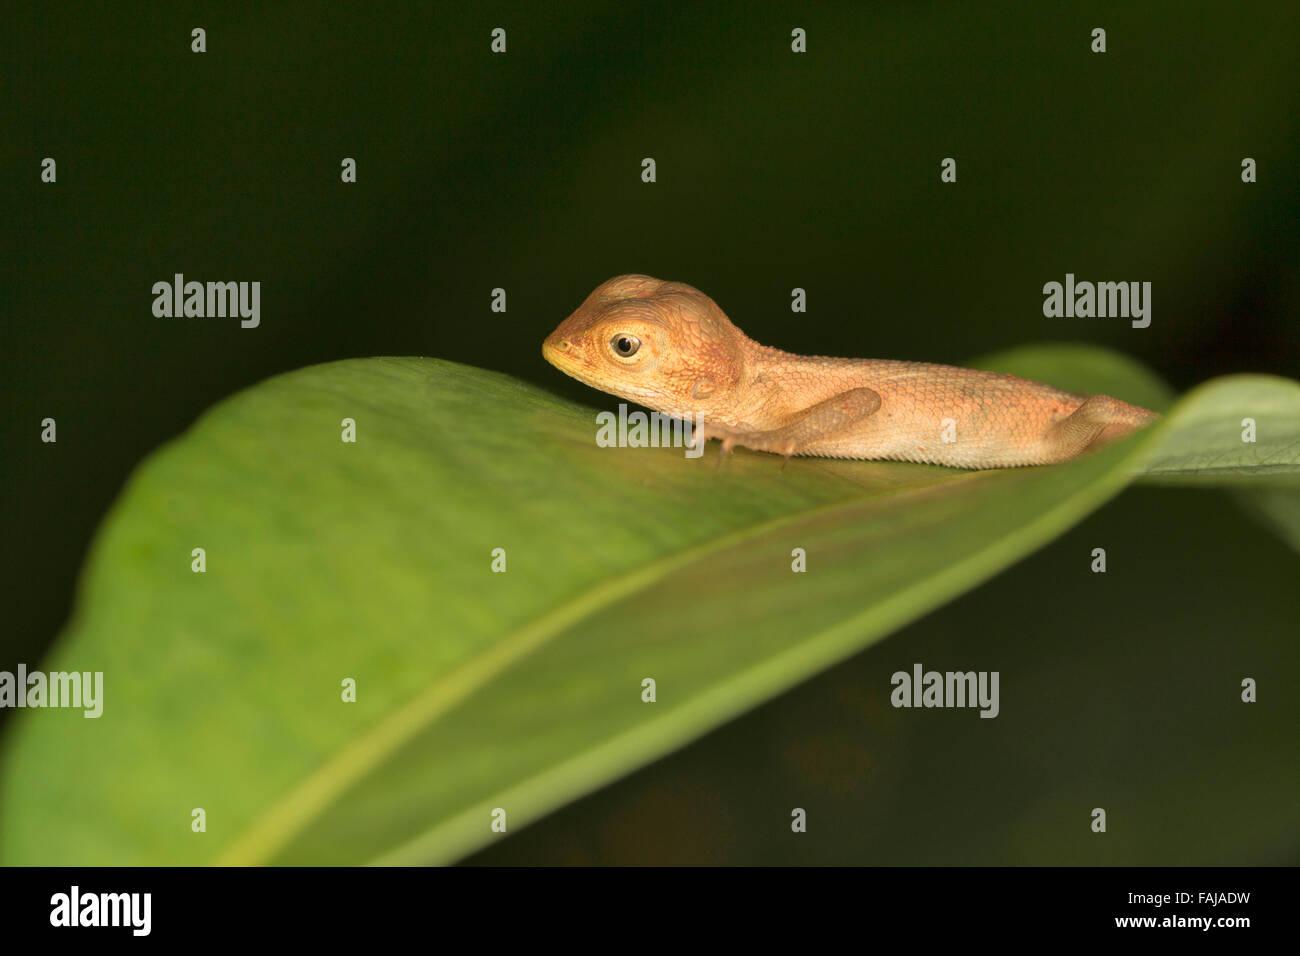 GEMEINEN Garten Eidechse, Calotes versicolor oder Blutsauger, Common, Aarey Milch Kolonie Indien Stockfoto